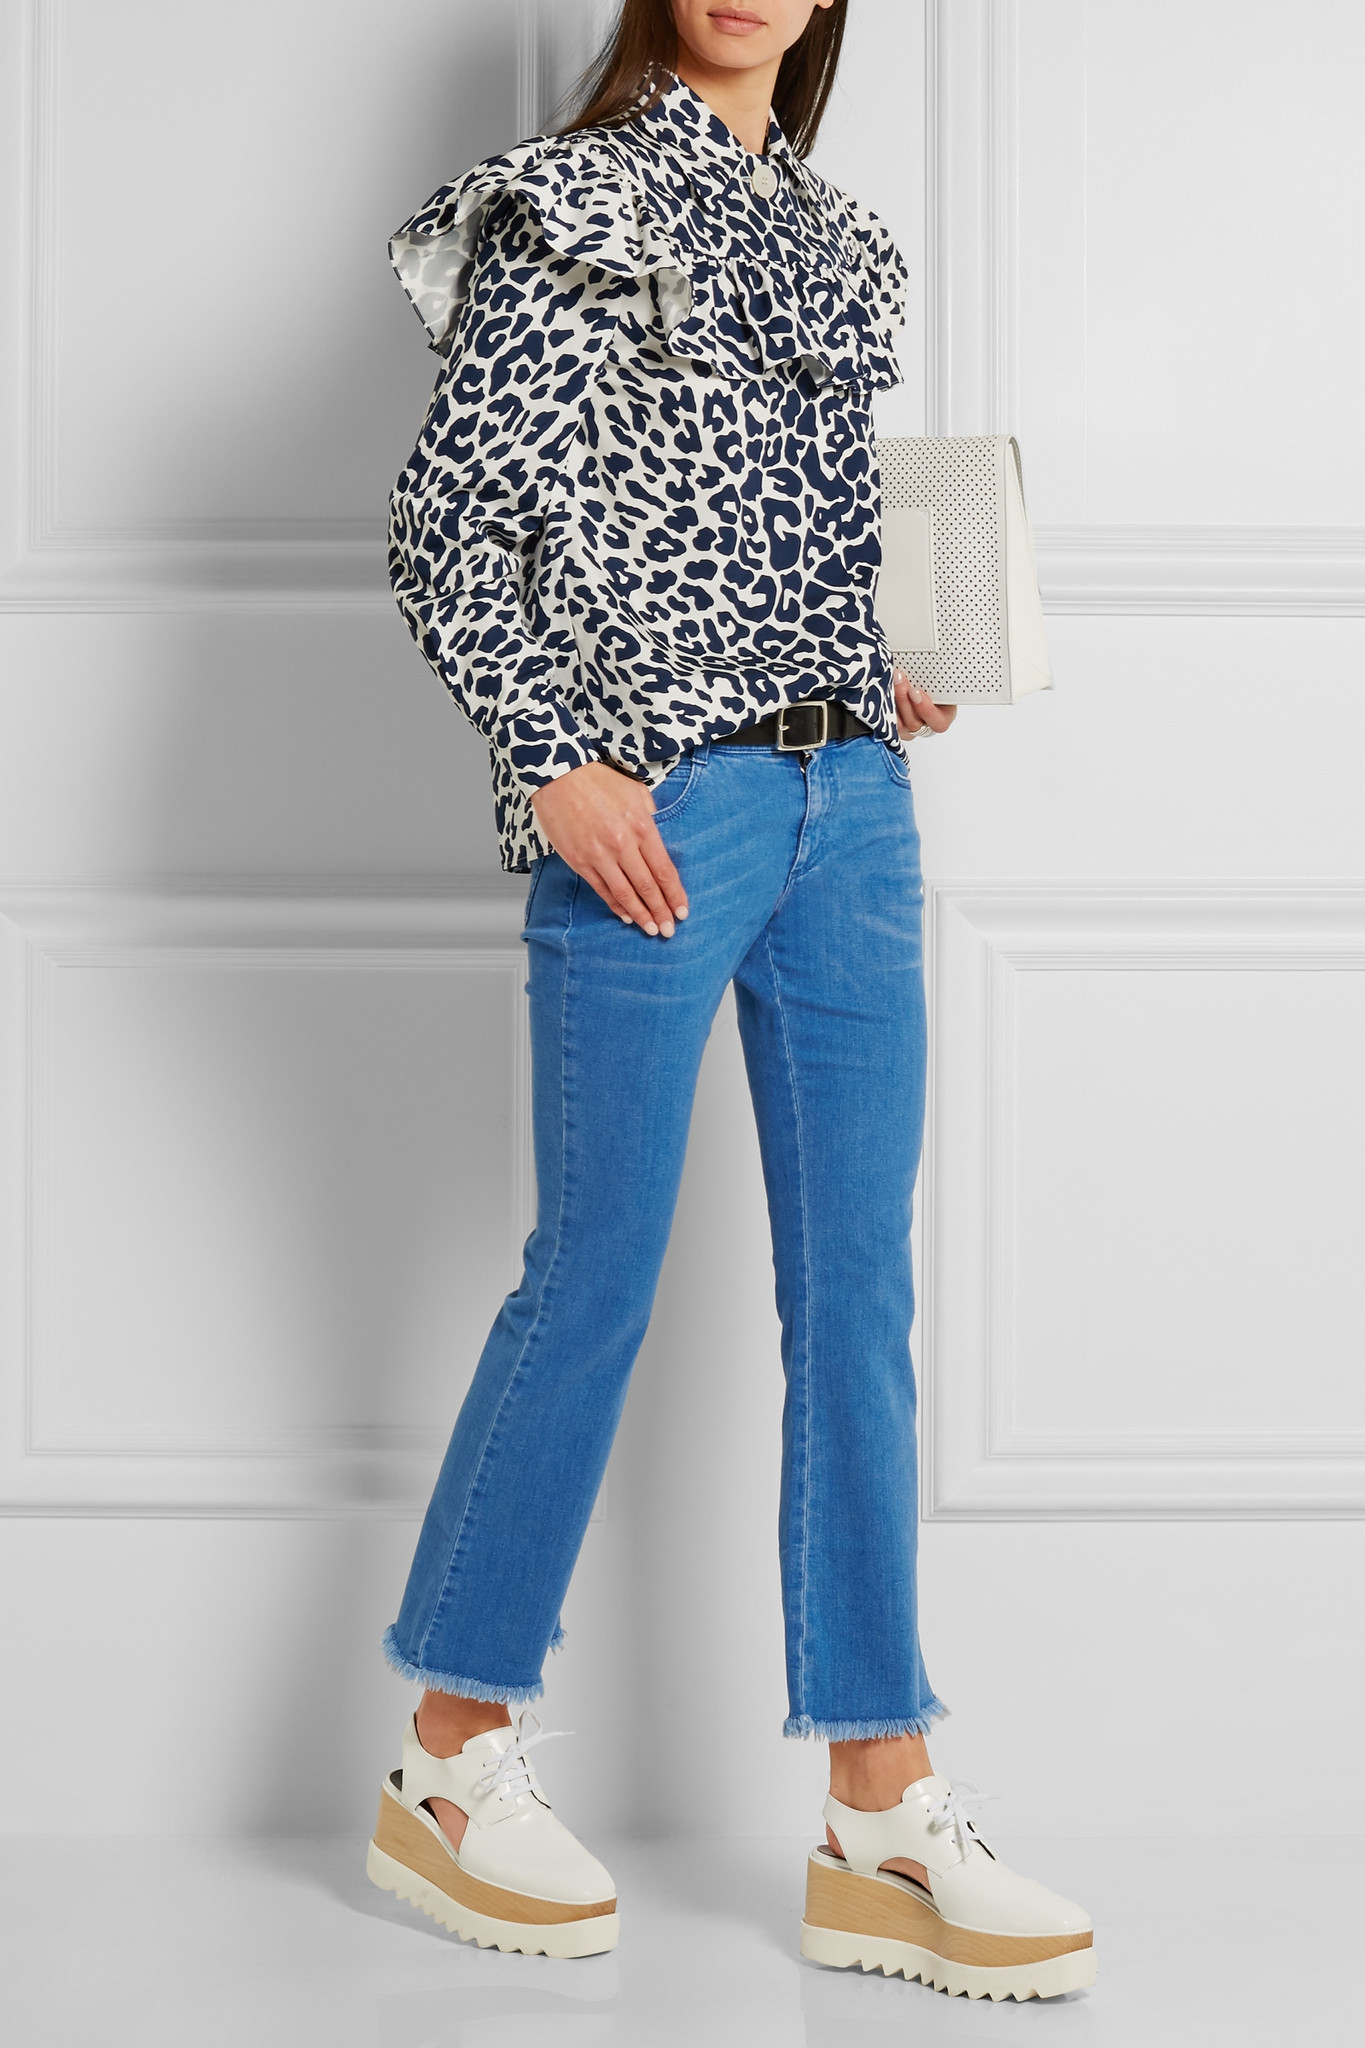 Stella Mccartney Woman Denim Loafers Mid Denim Size 39 Stella McCartney Kbz70DmqQ